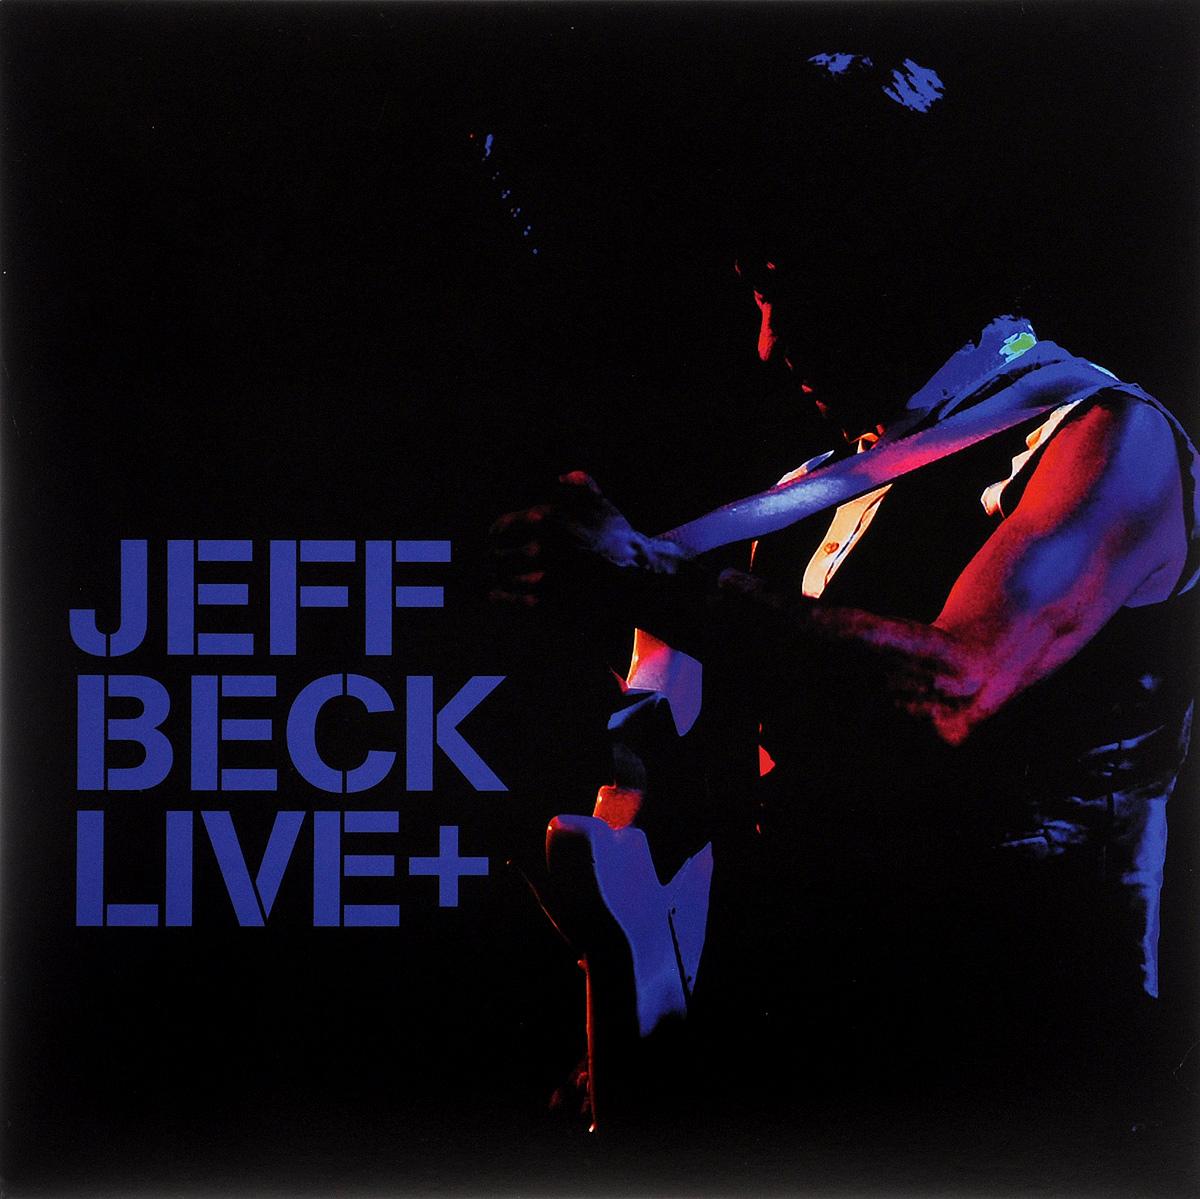 Джефф Бек Jeff Beck. Live + (2 LP) джефф бек jeff beck performing this week…live at ronnie scott s